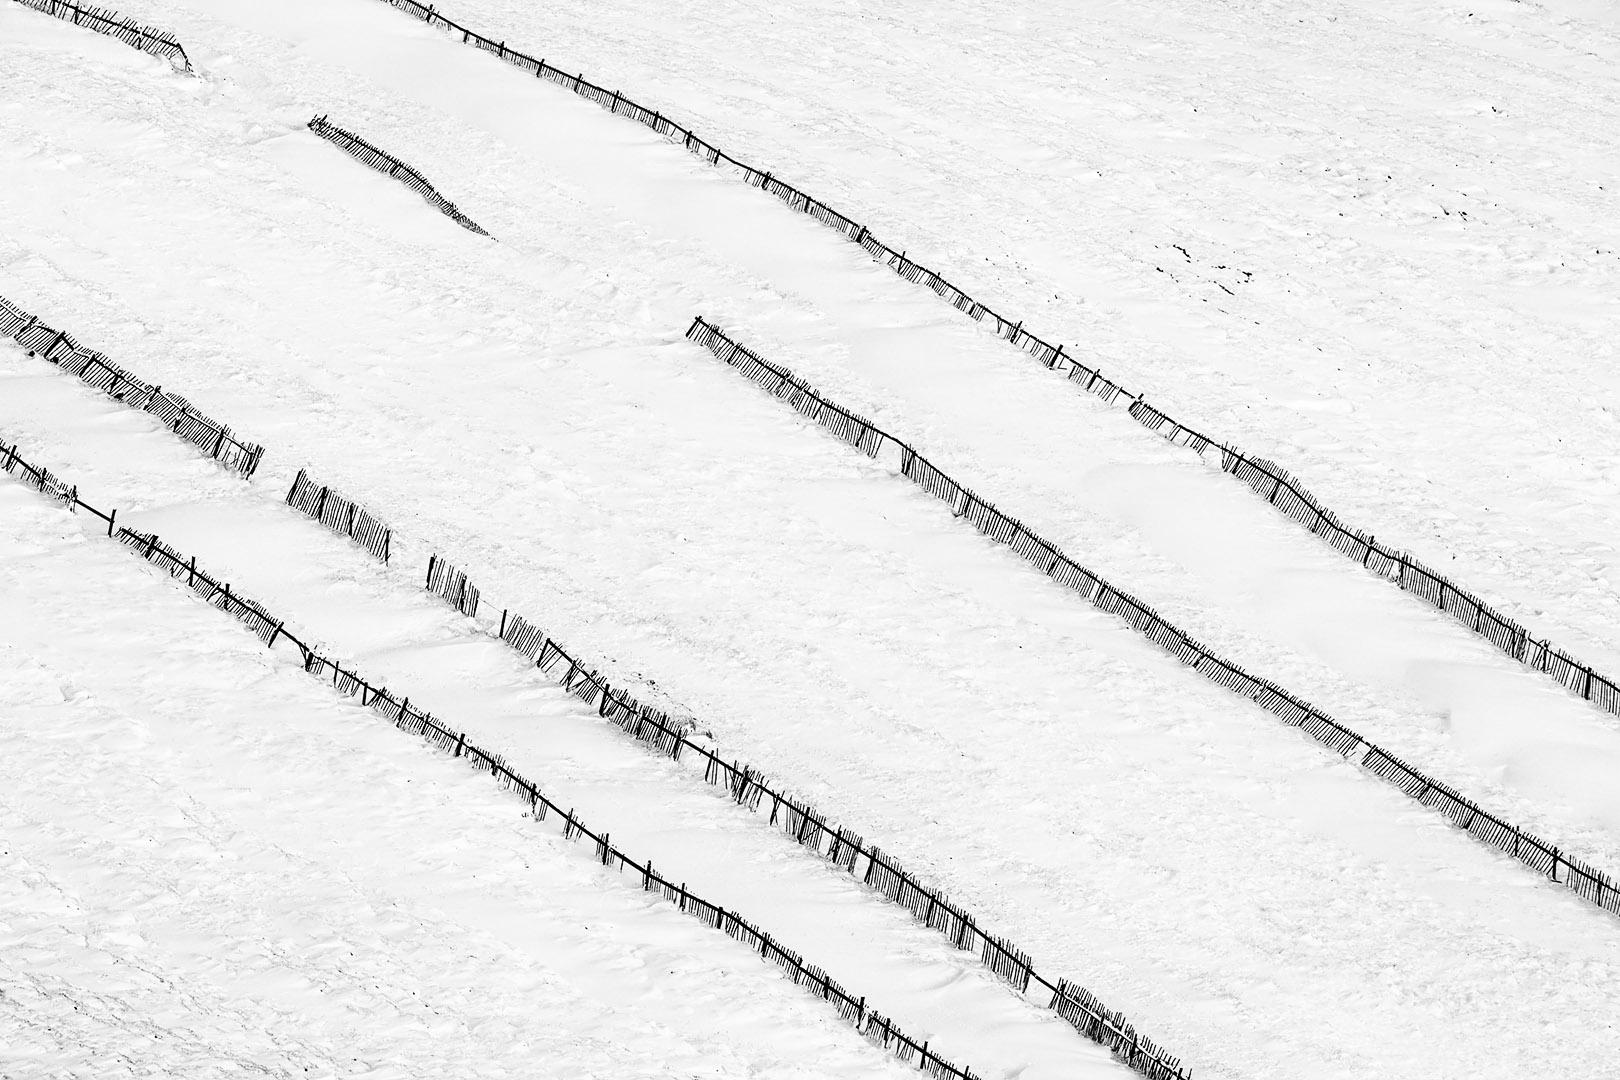 Snow Fence I